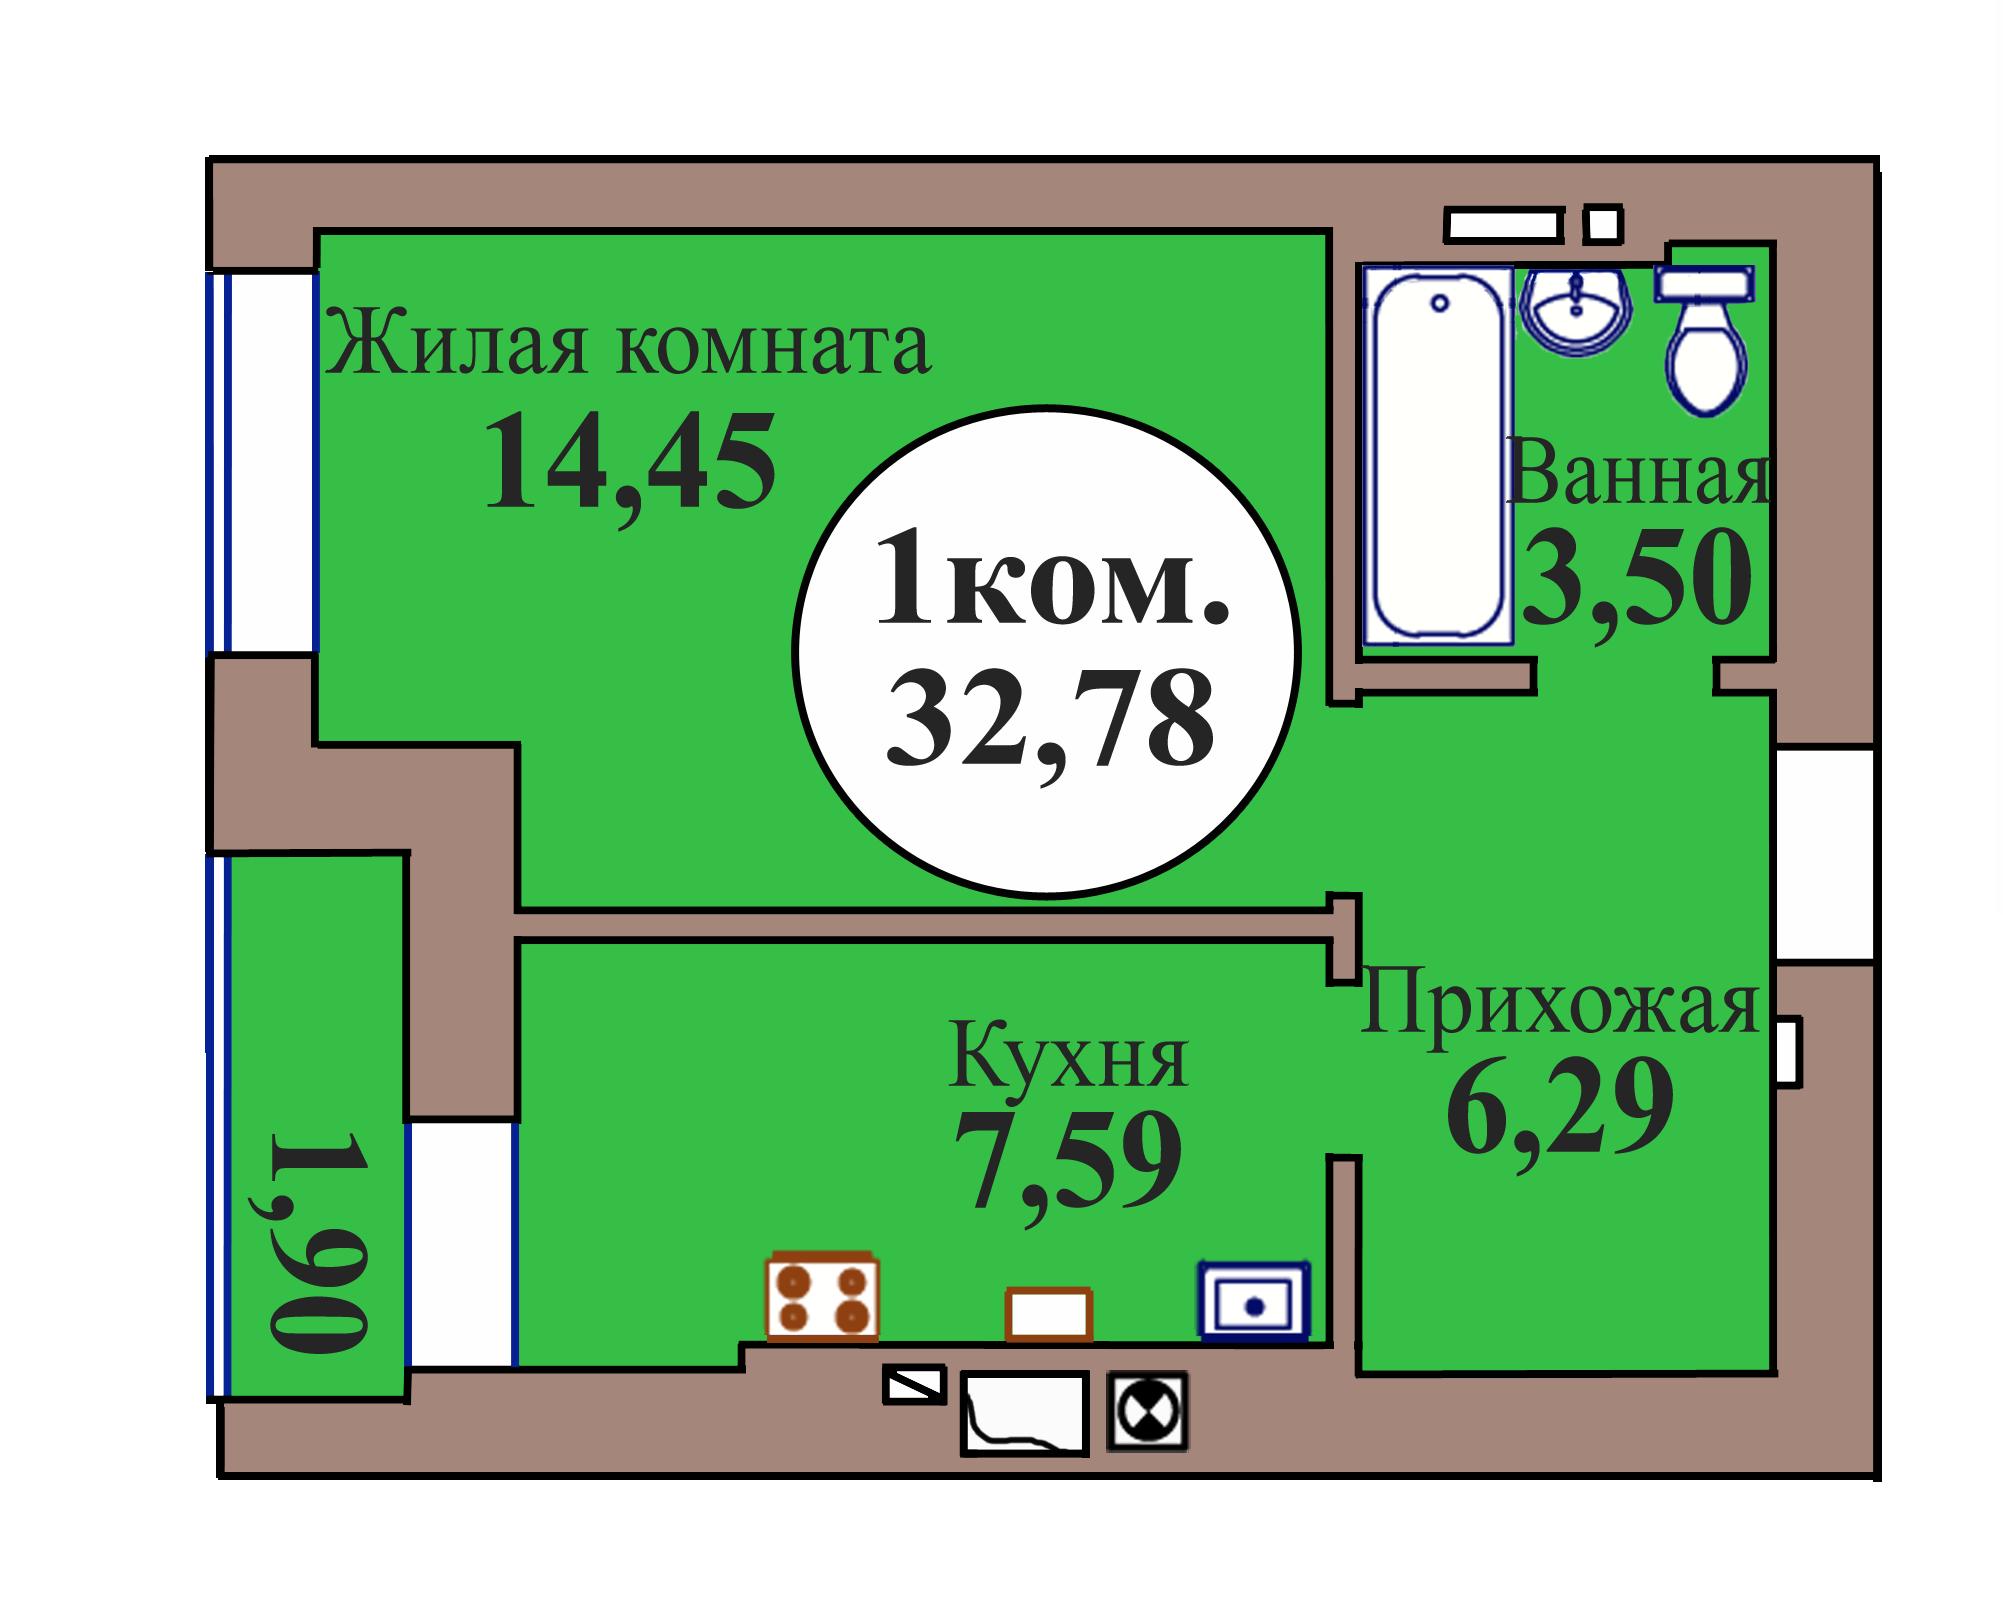 1-комн. кв. по пер. Калининградский, 5 кв. 59 в Калининграде